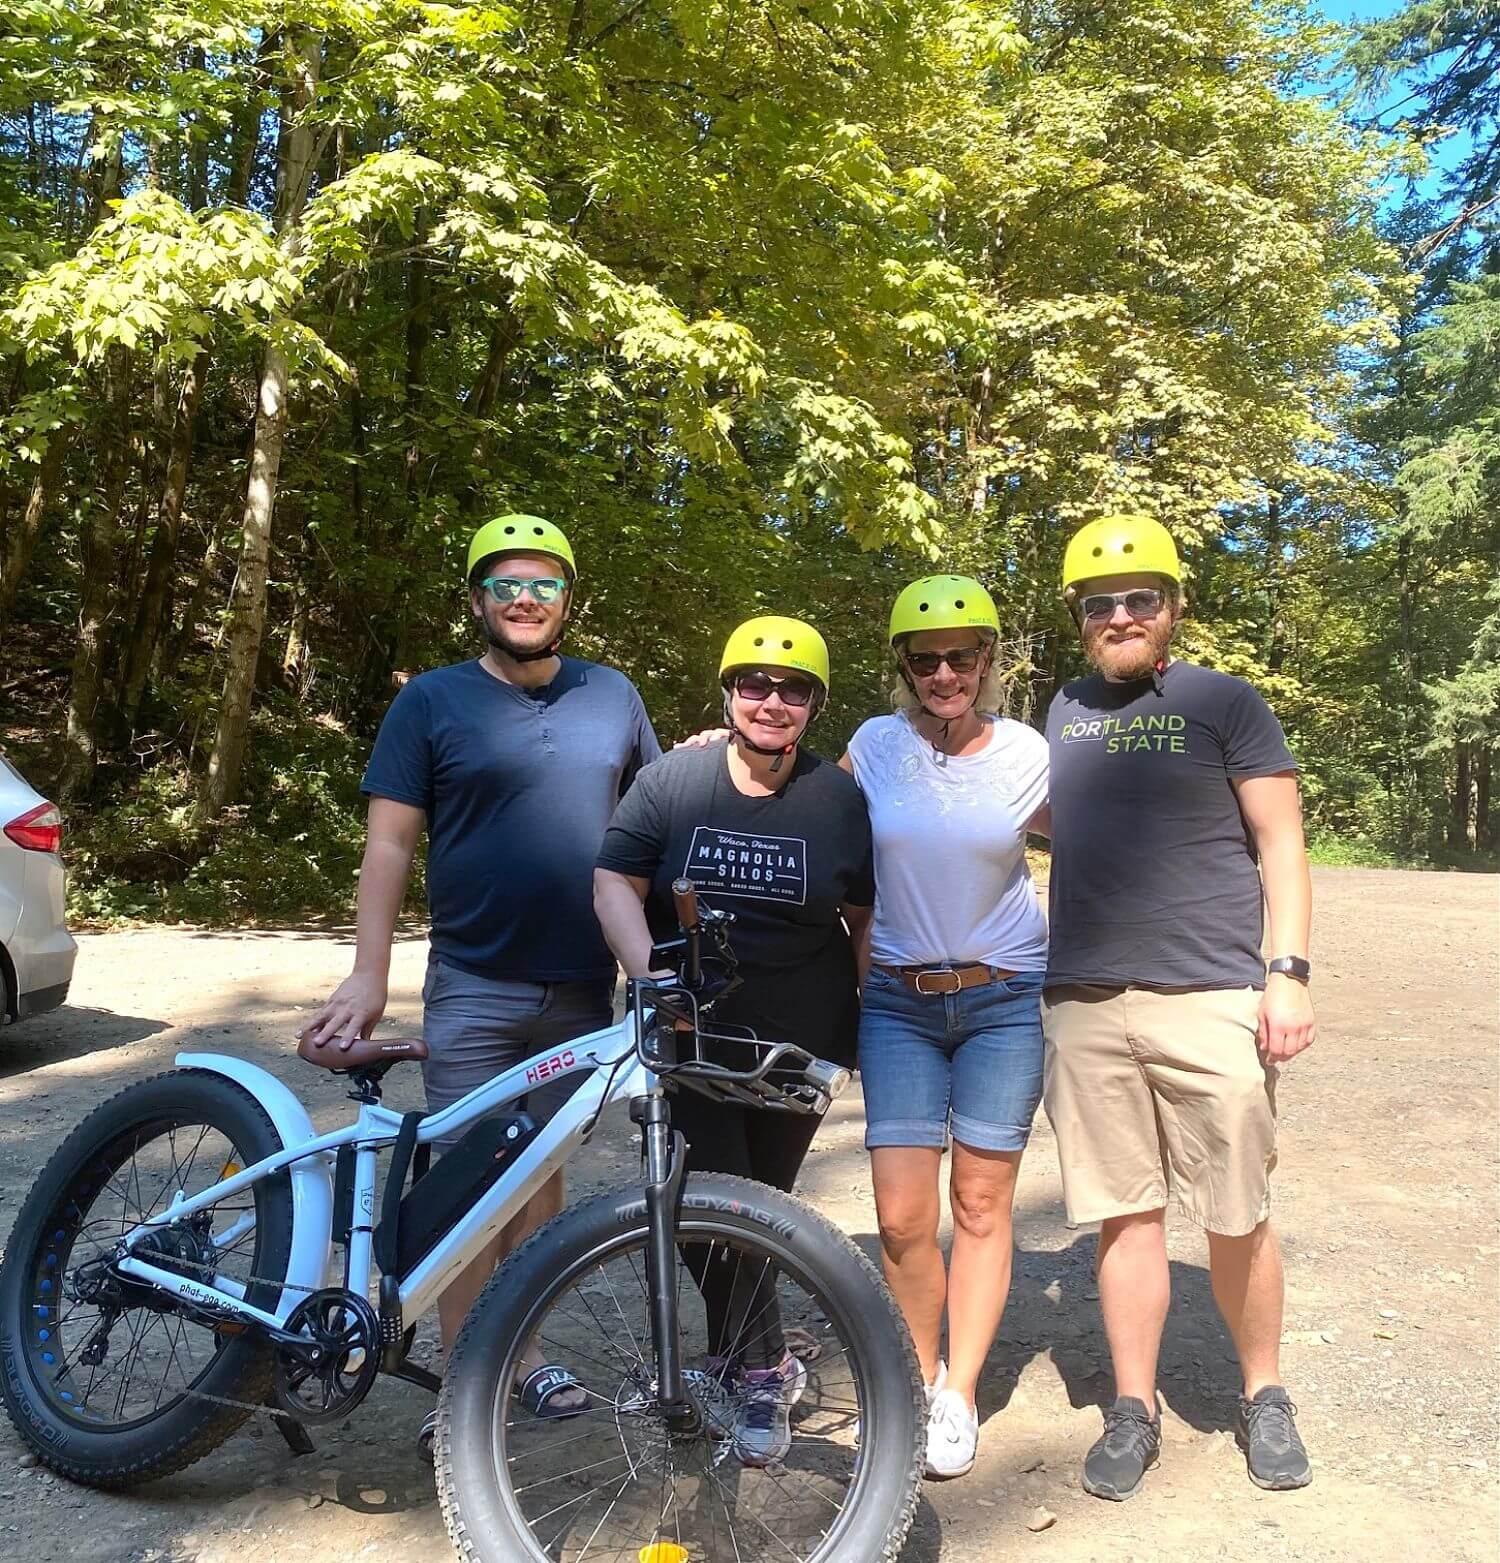 Columbia River Gorge Waterfalls Bike Tour